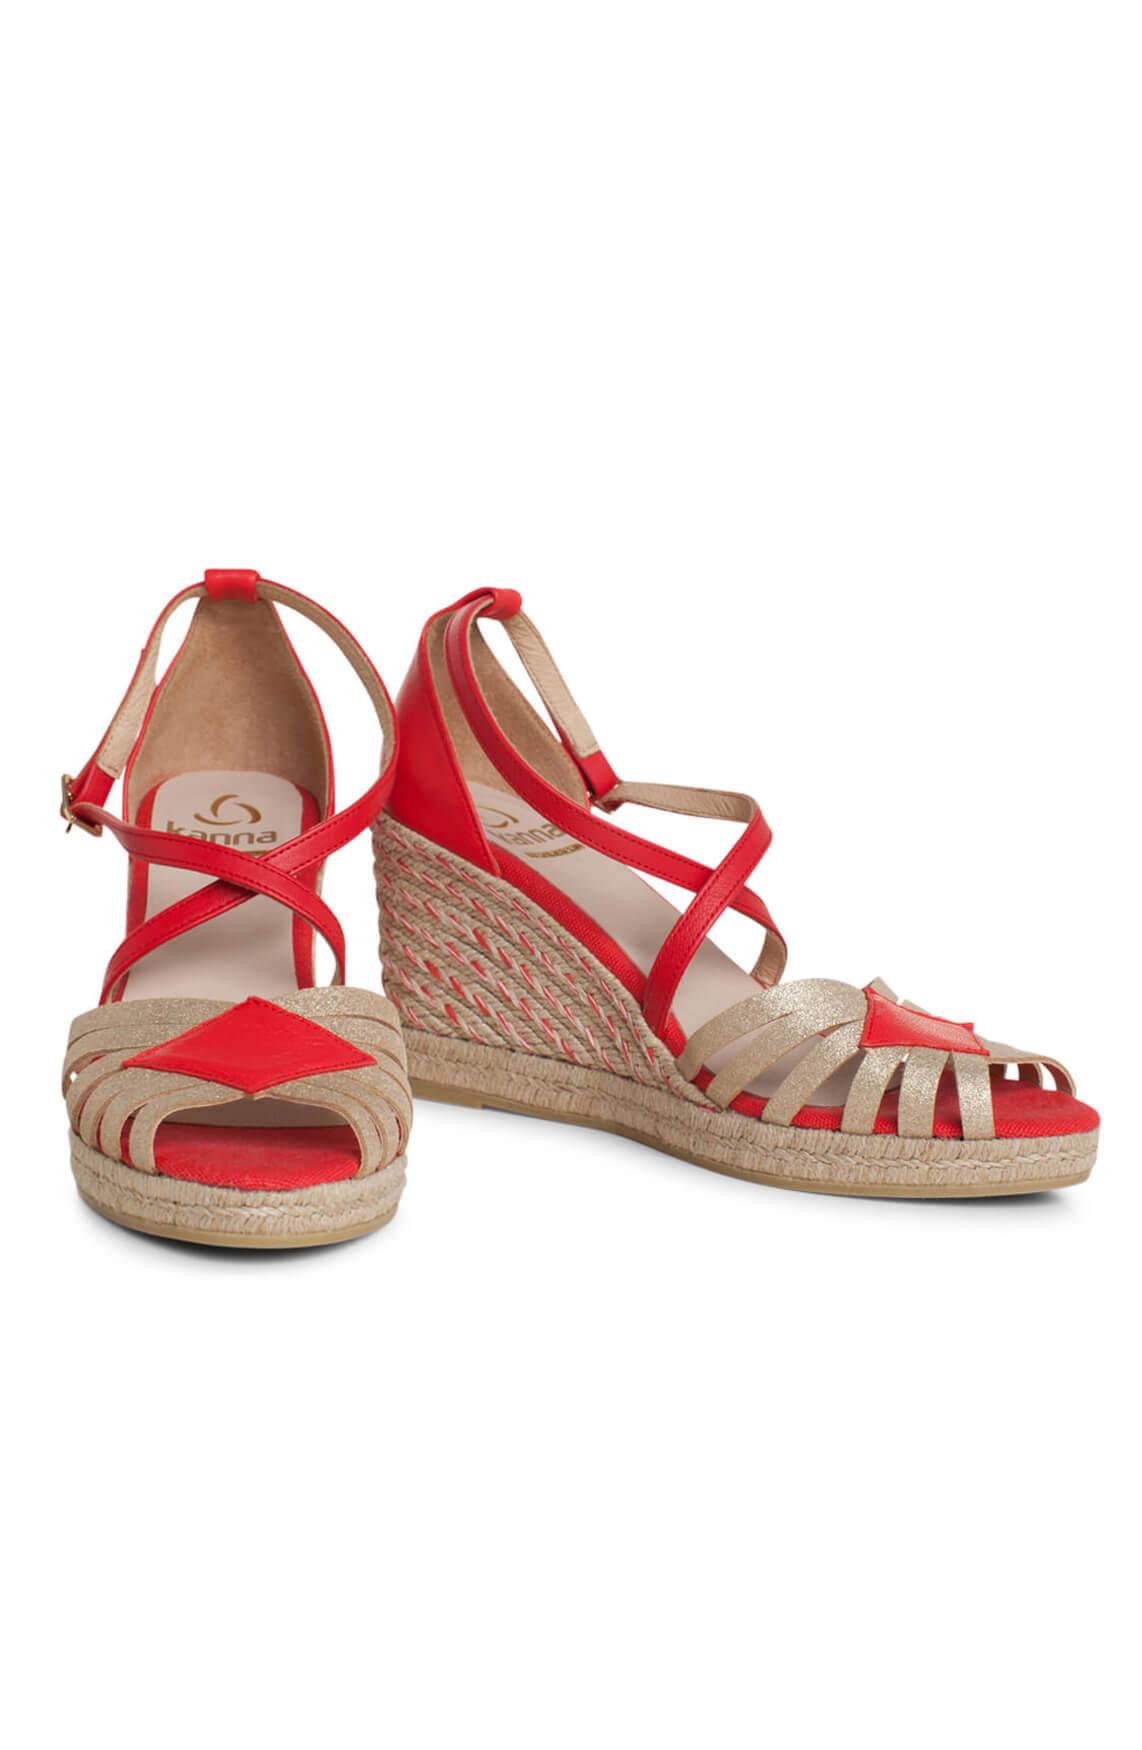 Kanna Dames Sandaal met lurex bandjes Rood